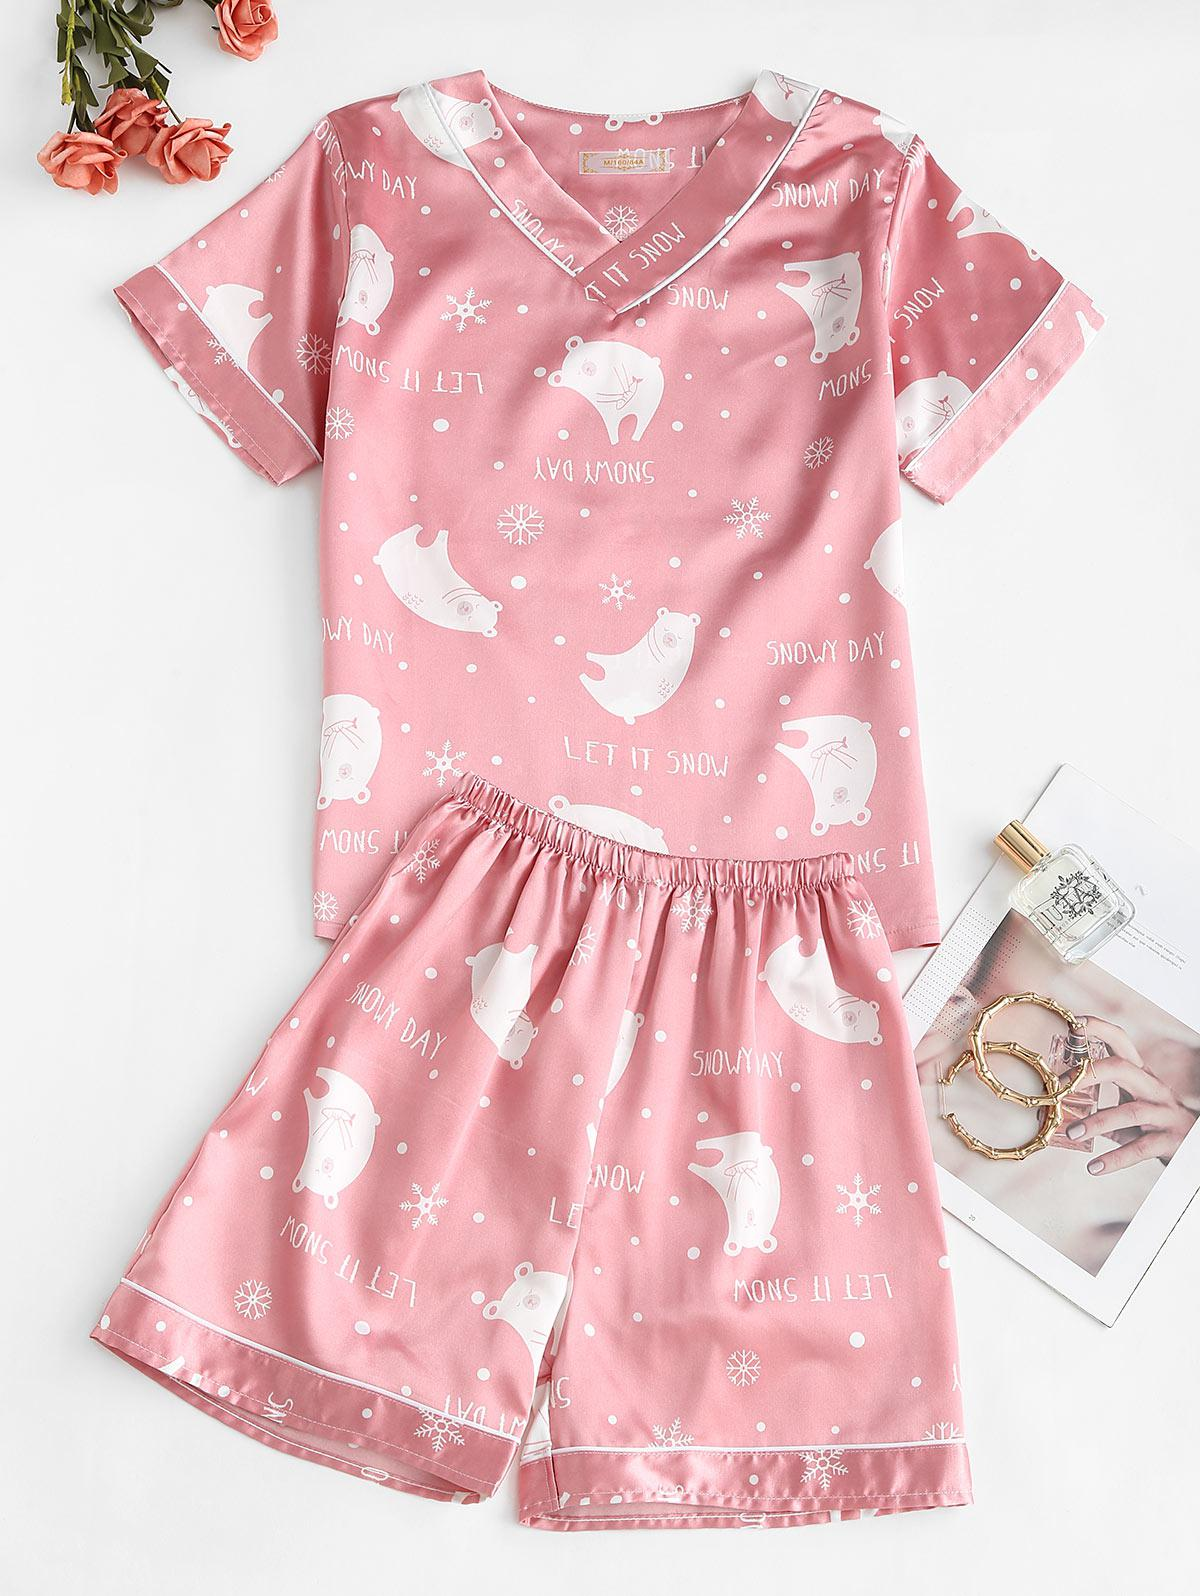 zaful Satin Snowy Day Graphic Pajama Shorts Set